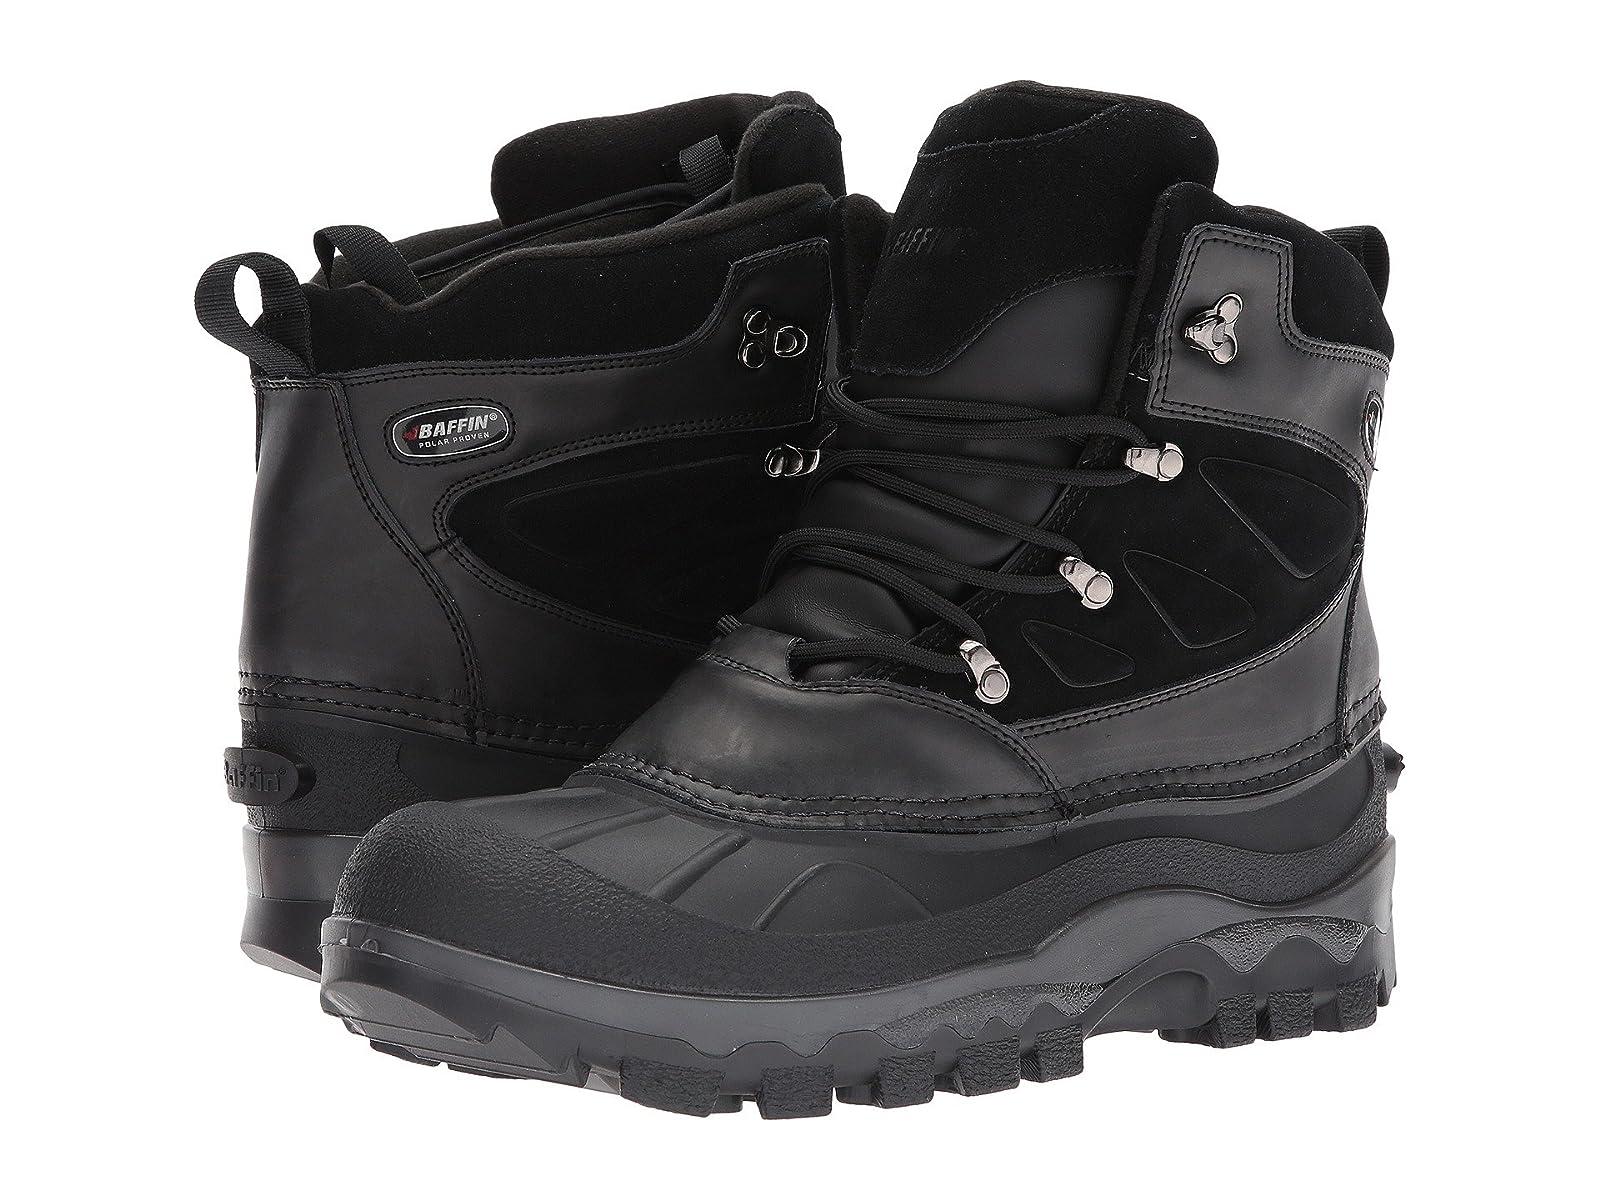 Baffin EllesmereCheap and distinctive eye-catching shoes